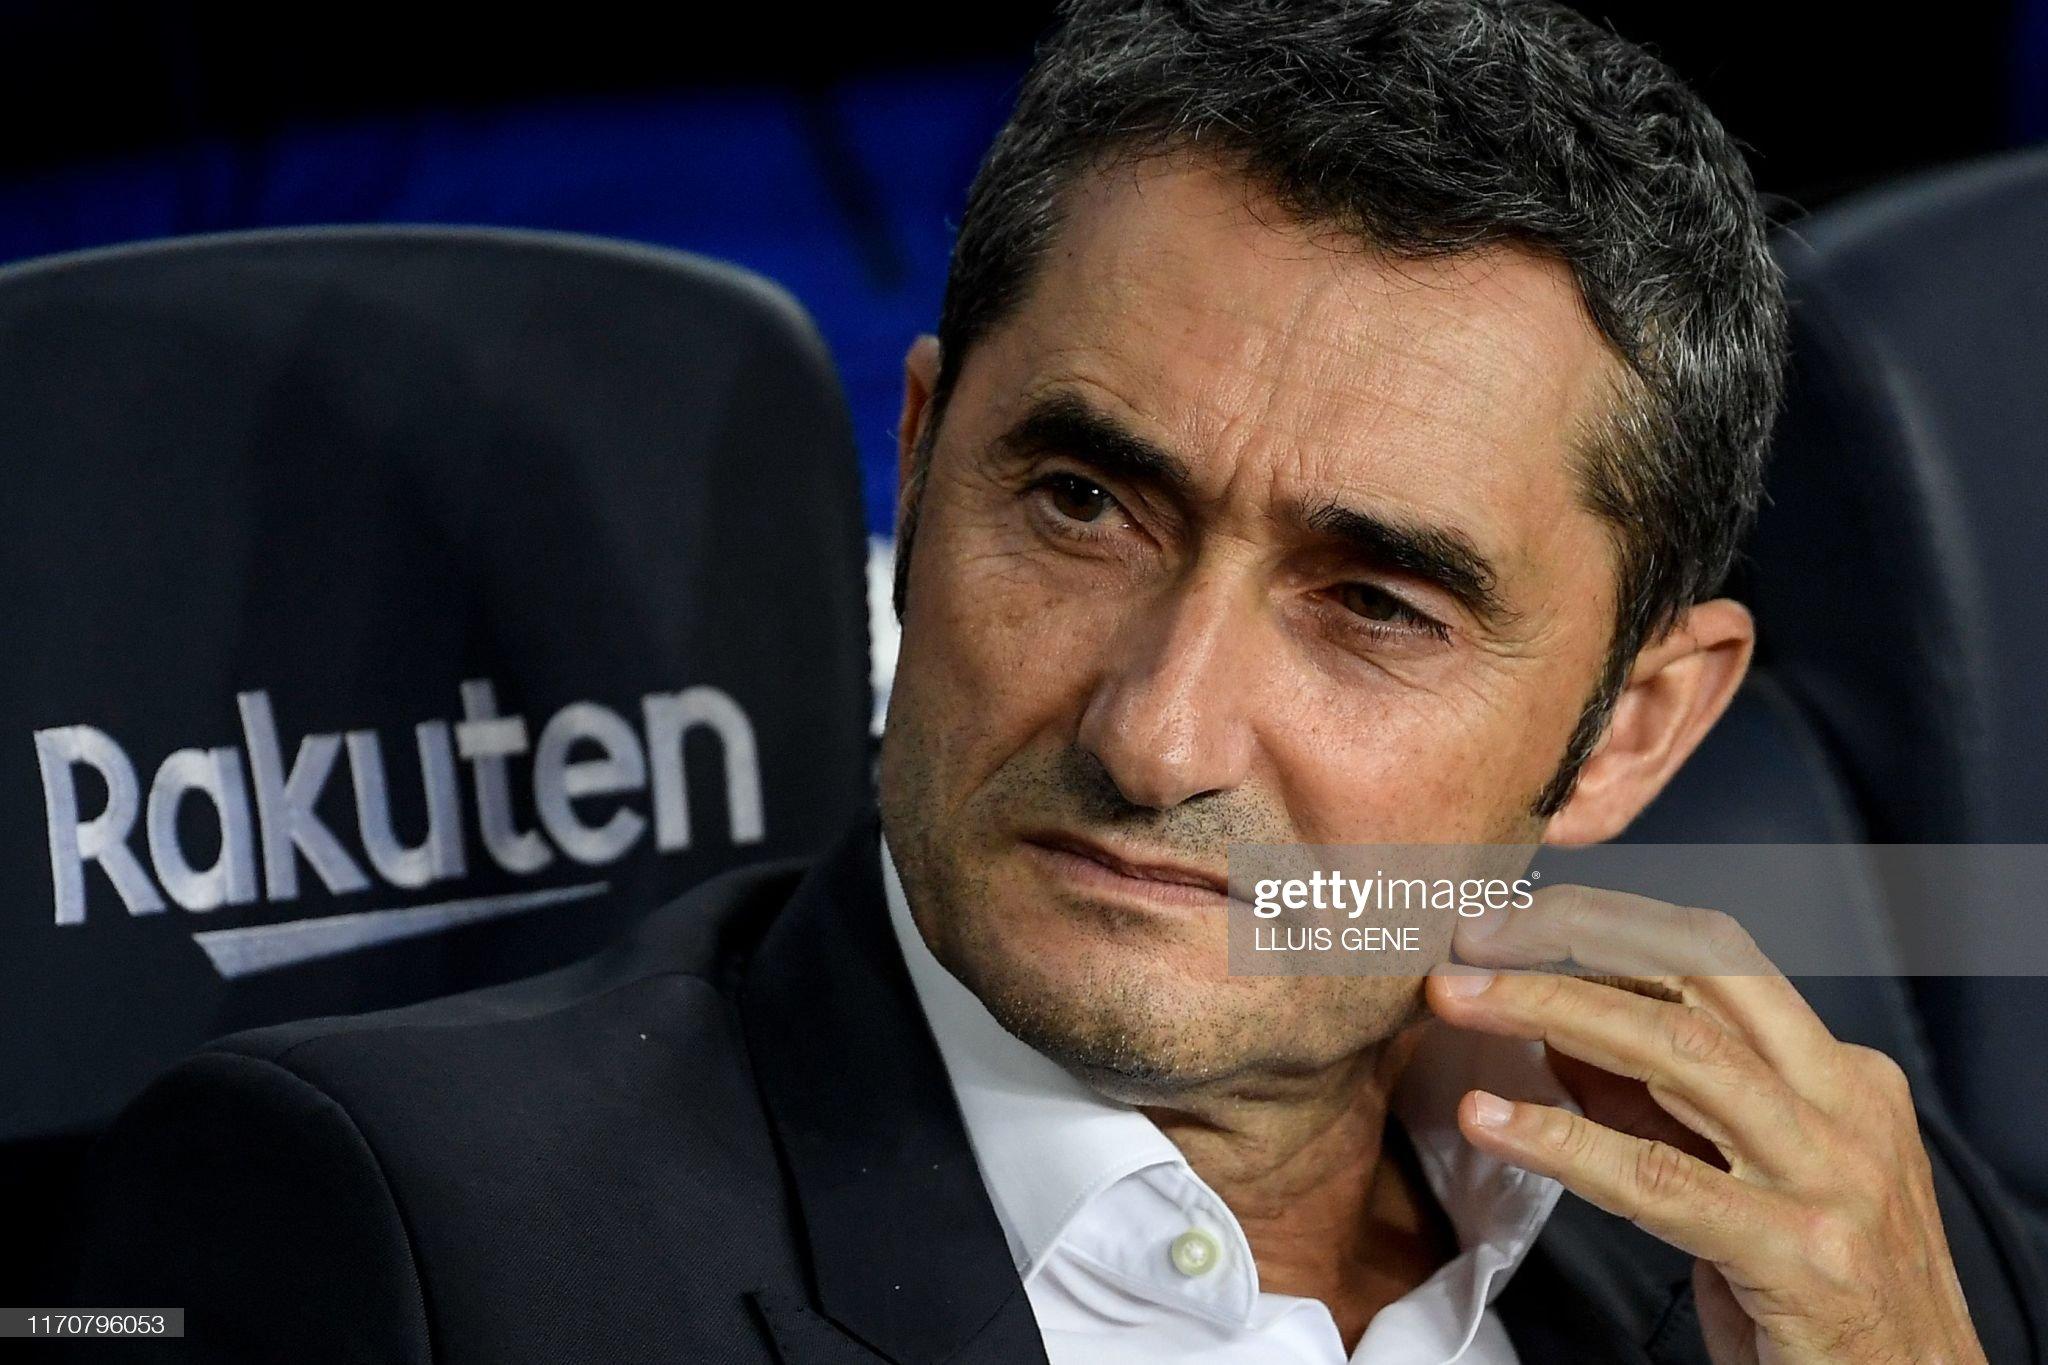 صور مباراة : برشلونة - فياريال 2-1 ( 24-09-2019 )  Barcelonas-spanish-coach-ernesto-valverde-looks-on-prior-to-the-picture-id1170796053?s=2048x2048